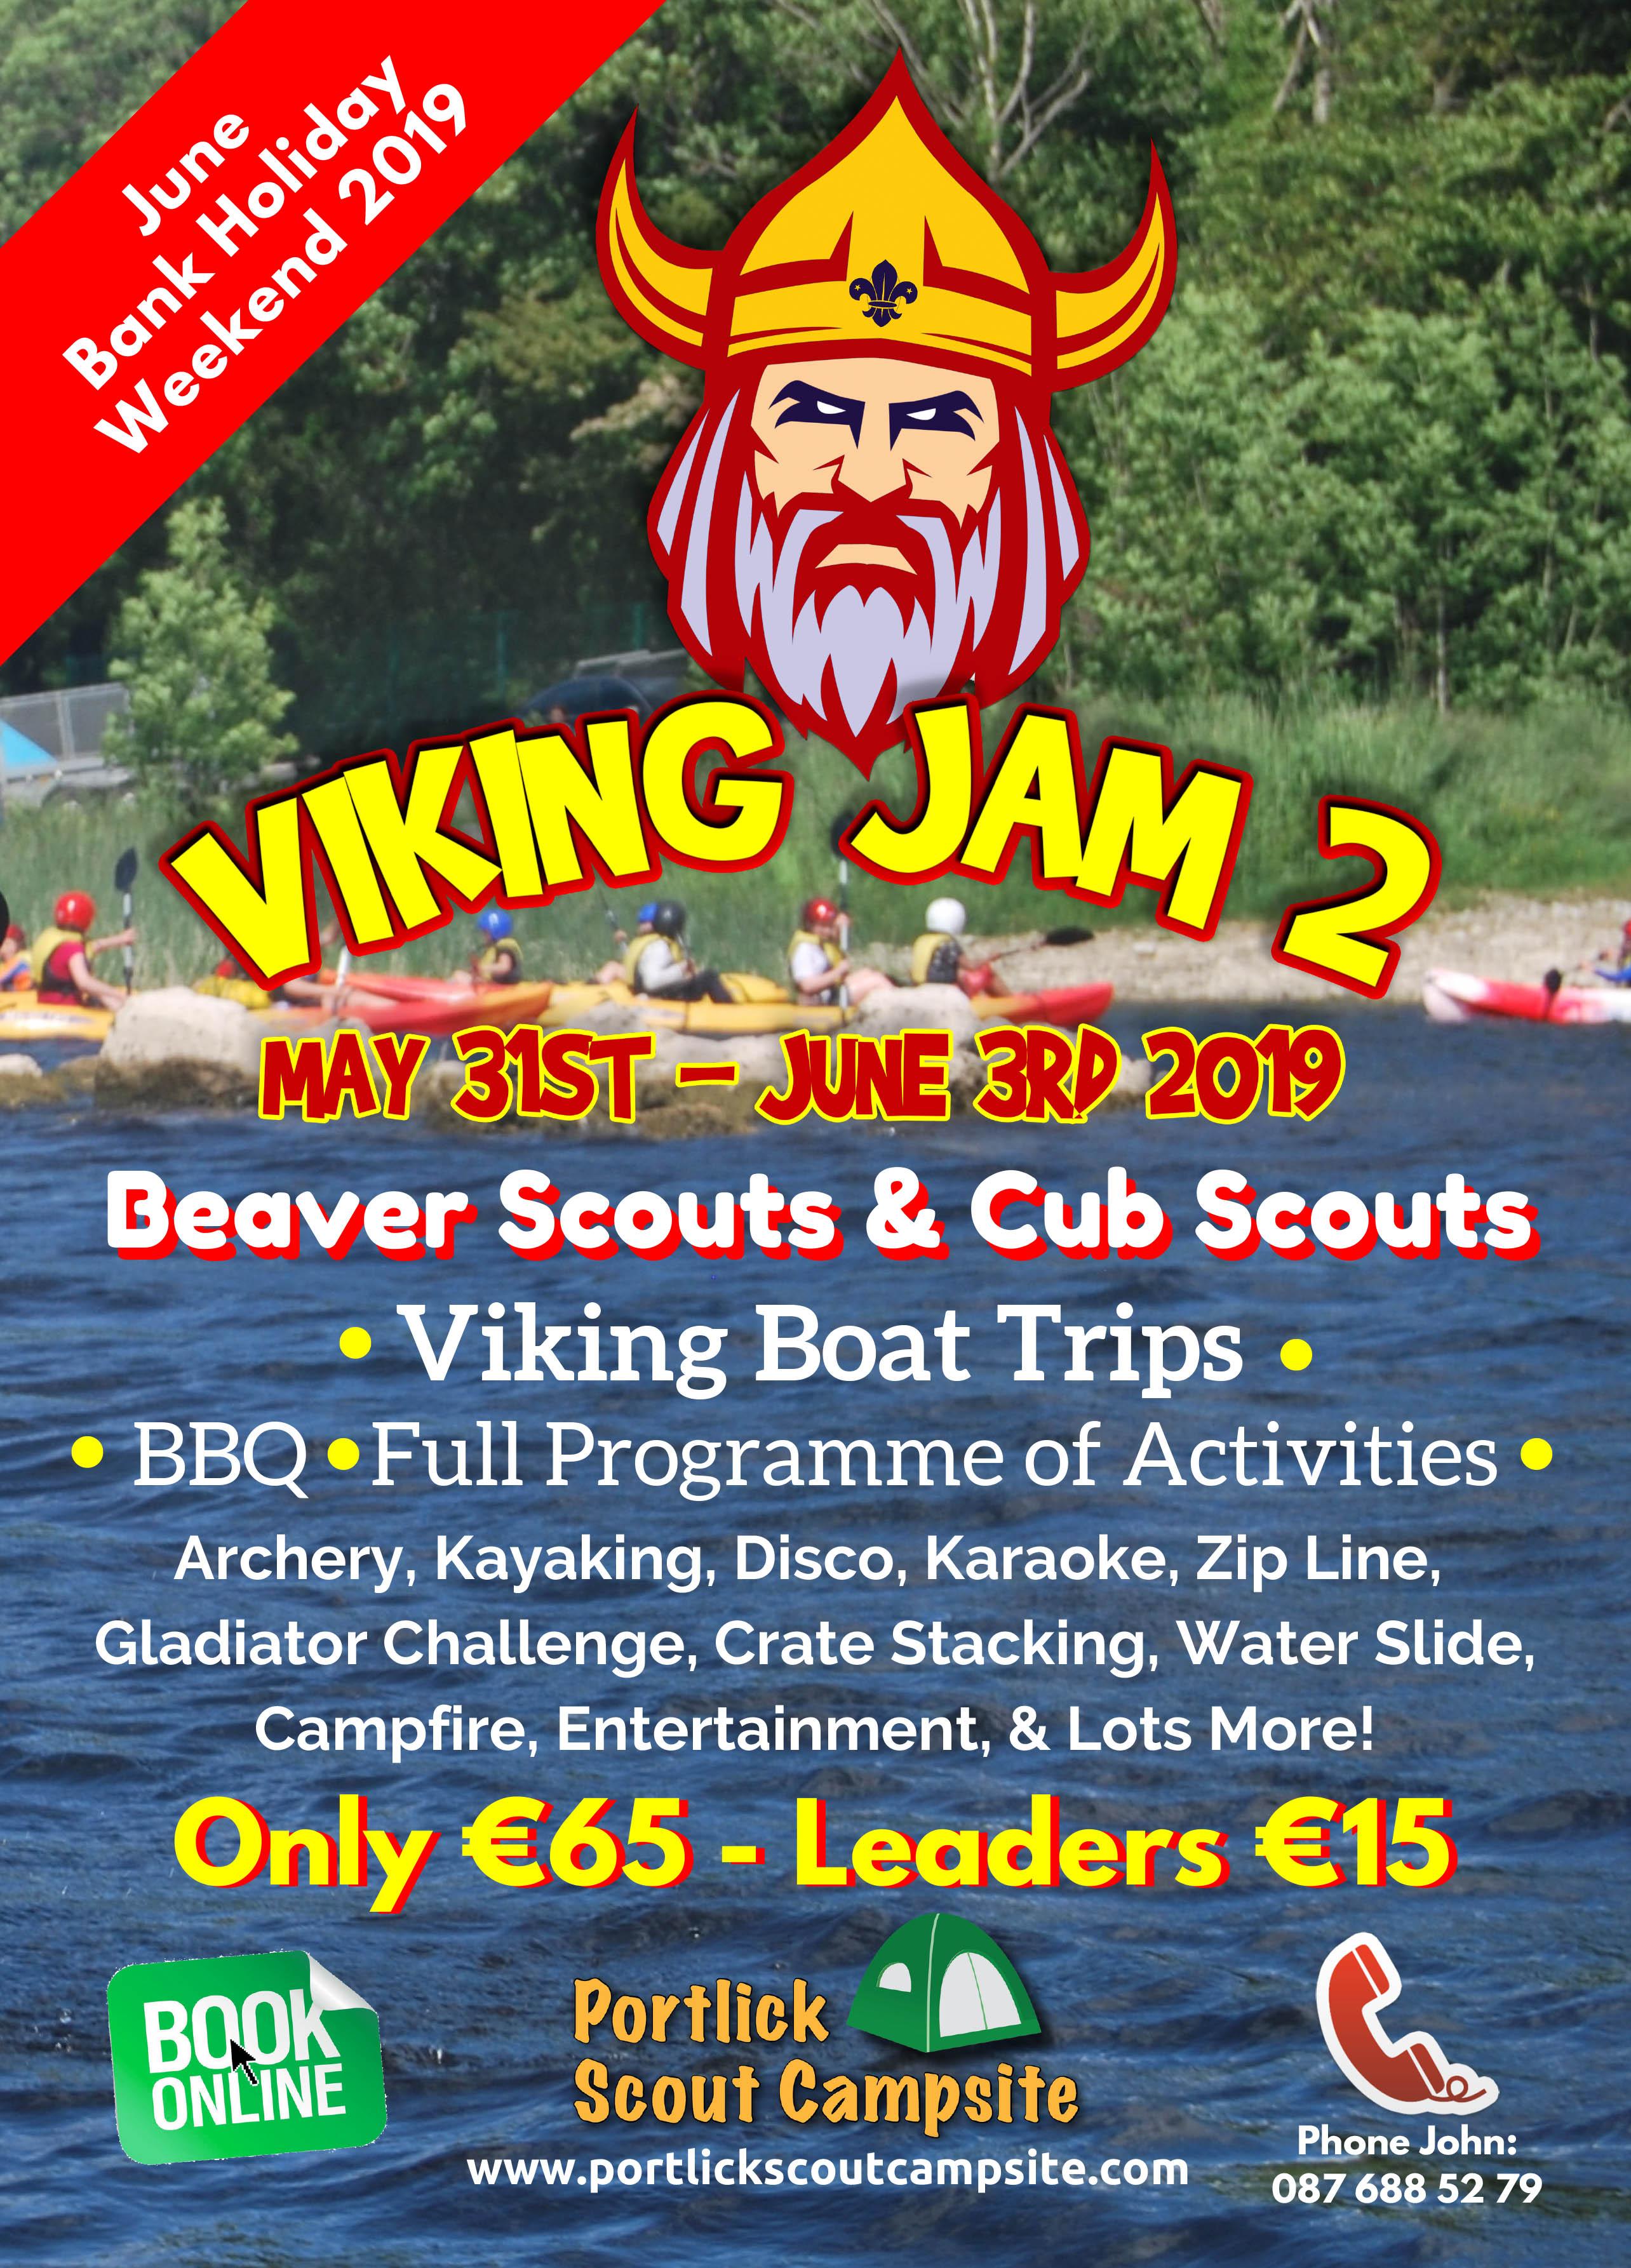 Viking Jam, Portlick Scout Campsite